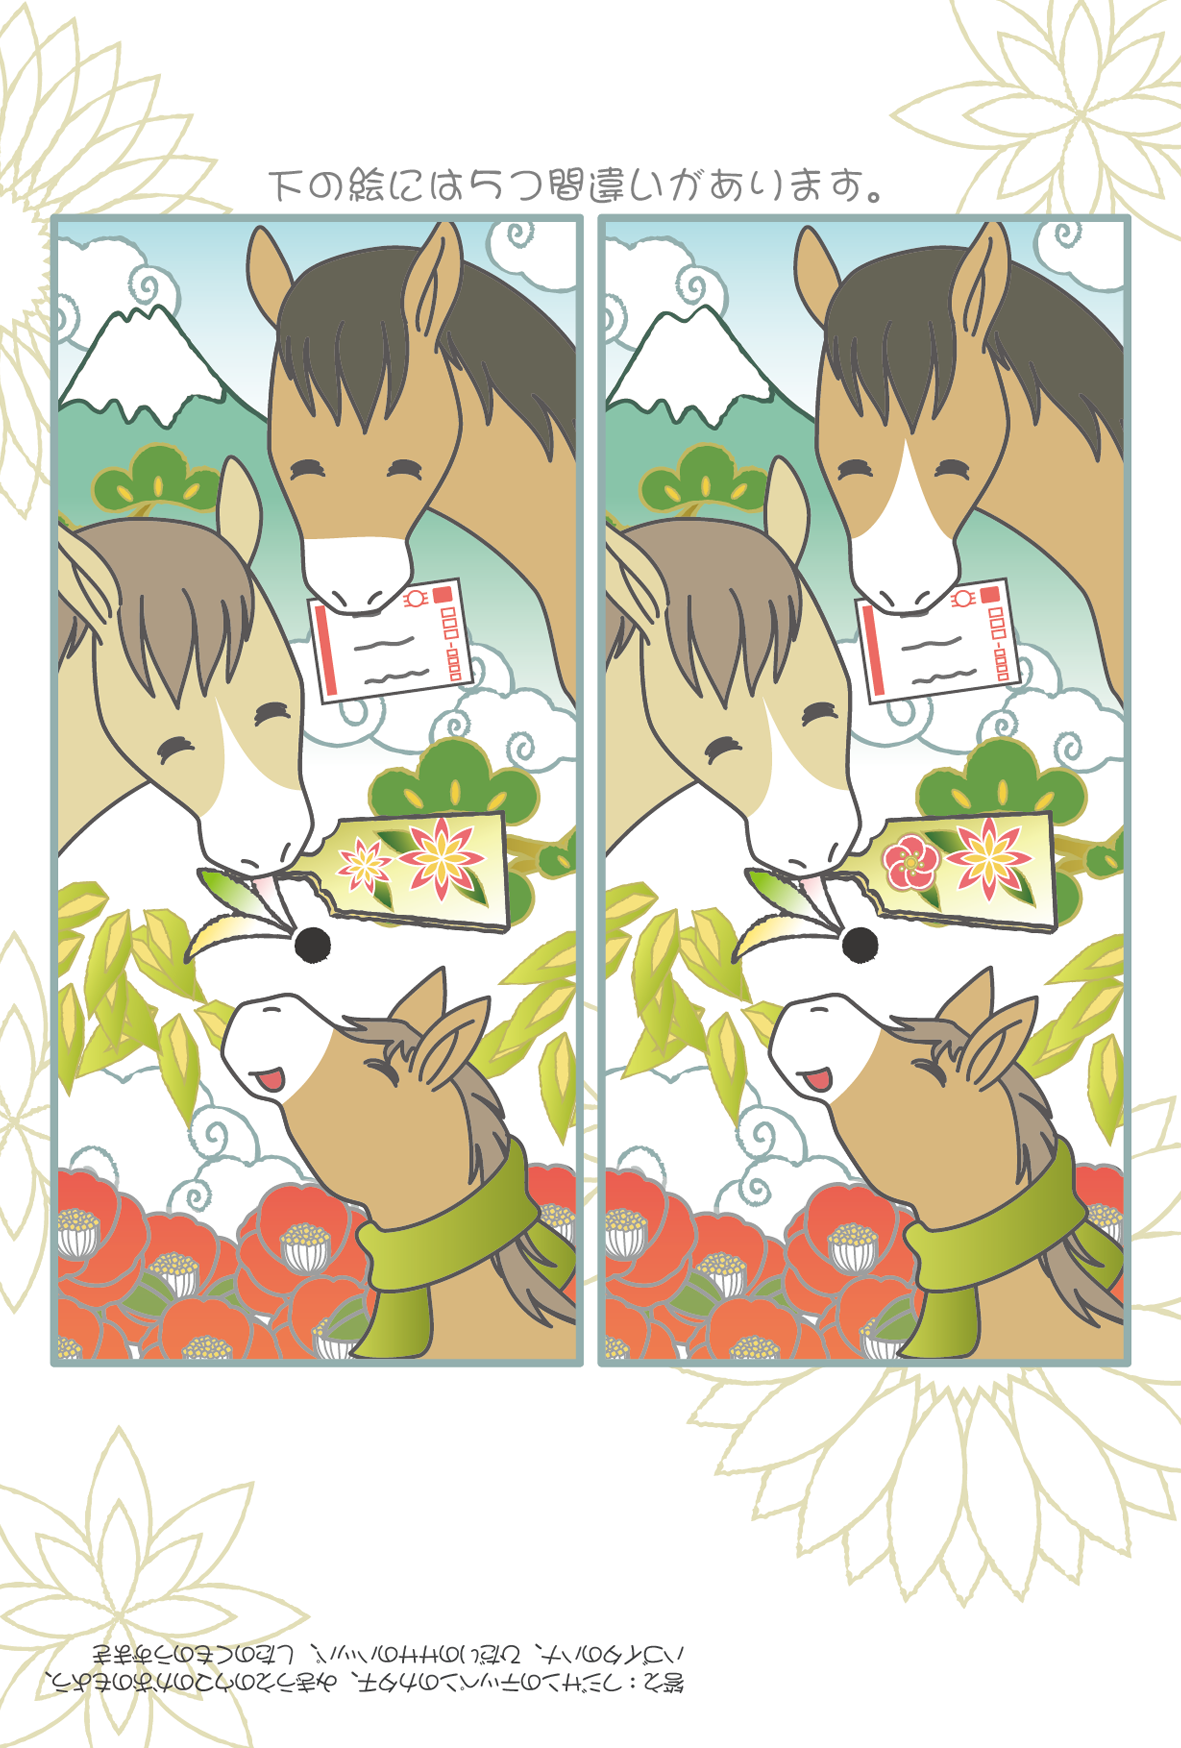 夢夢色TOWN | 2014年午(馬)年用 ... : 間違い探し 印刷 : 印刷